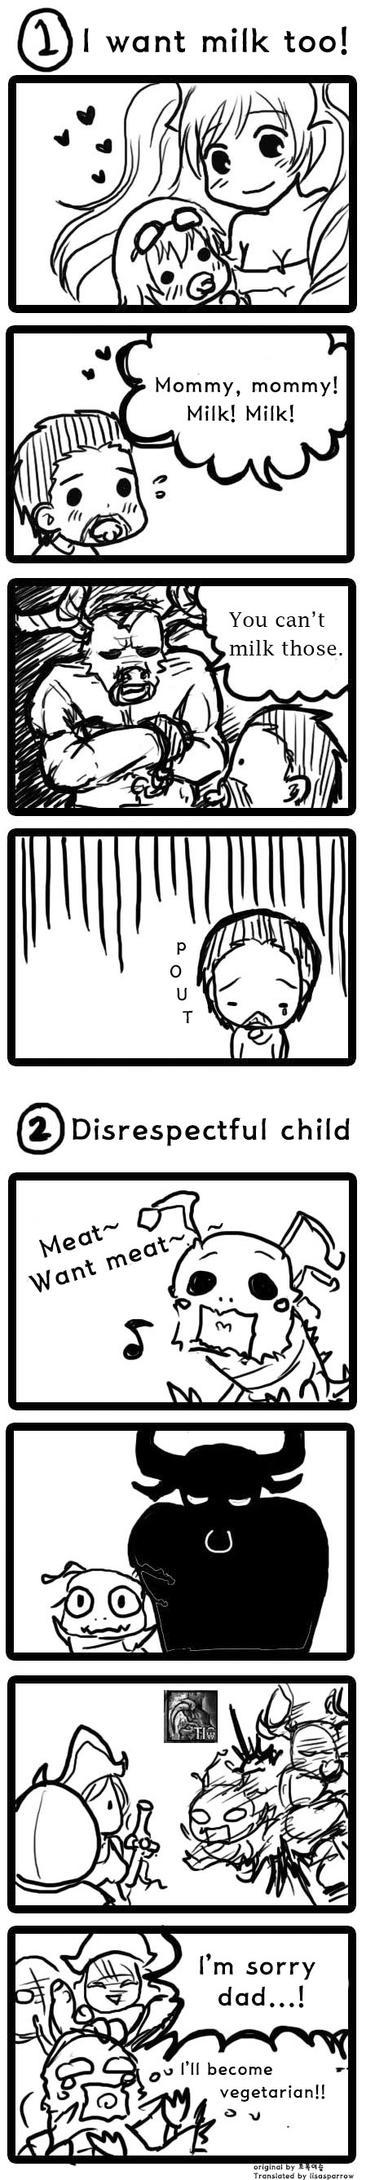 Lulu and Varus comic 1-2: Mommy or Daddy? by JackieDanielStark